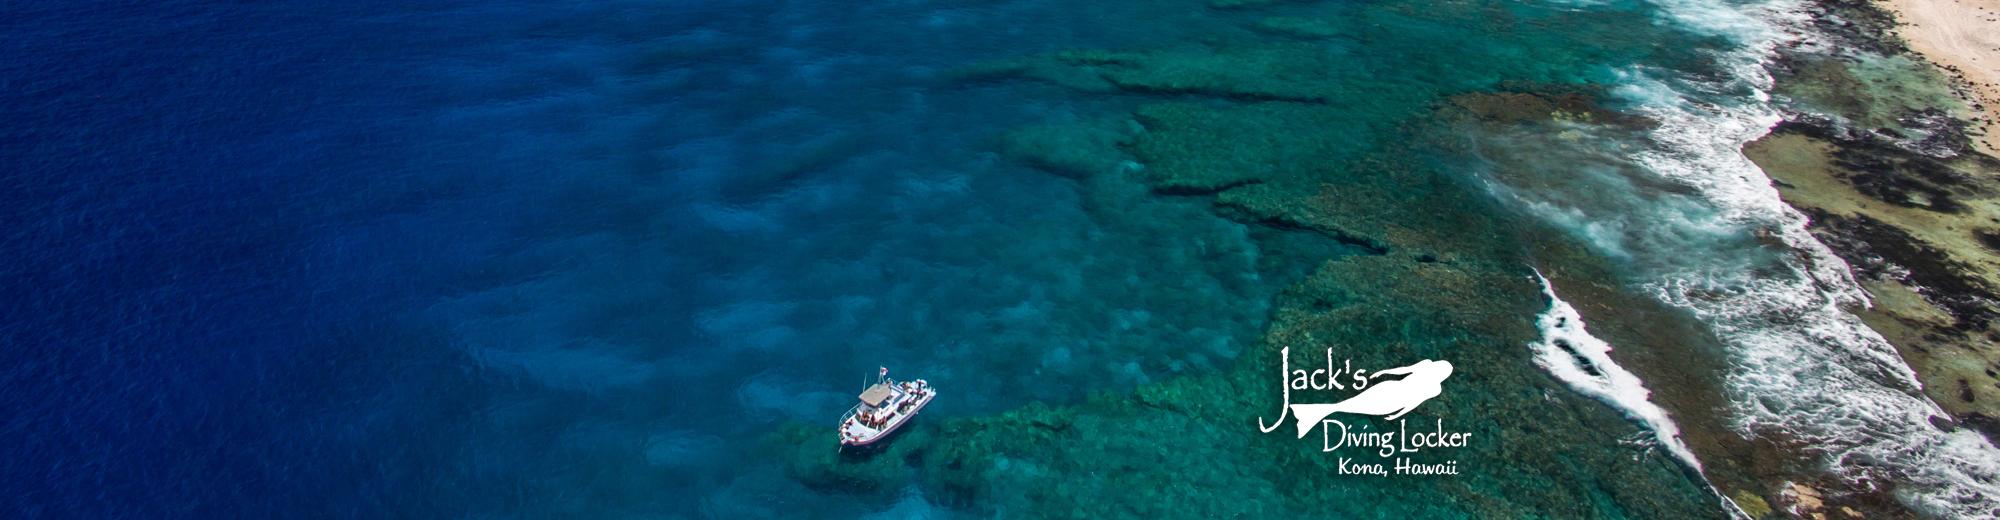 Jack's Diving Locker Dive Boat, Kailua Kona, Hawaii